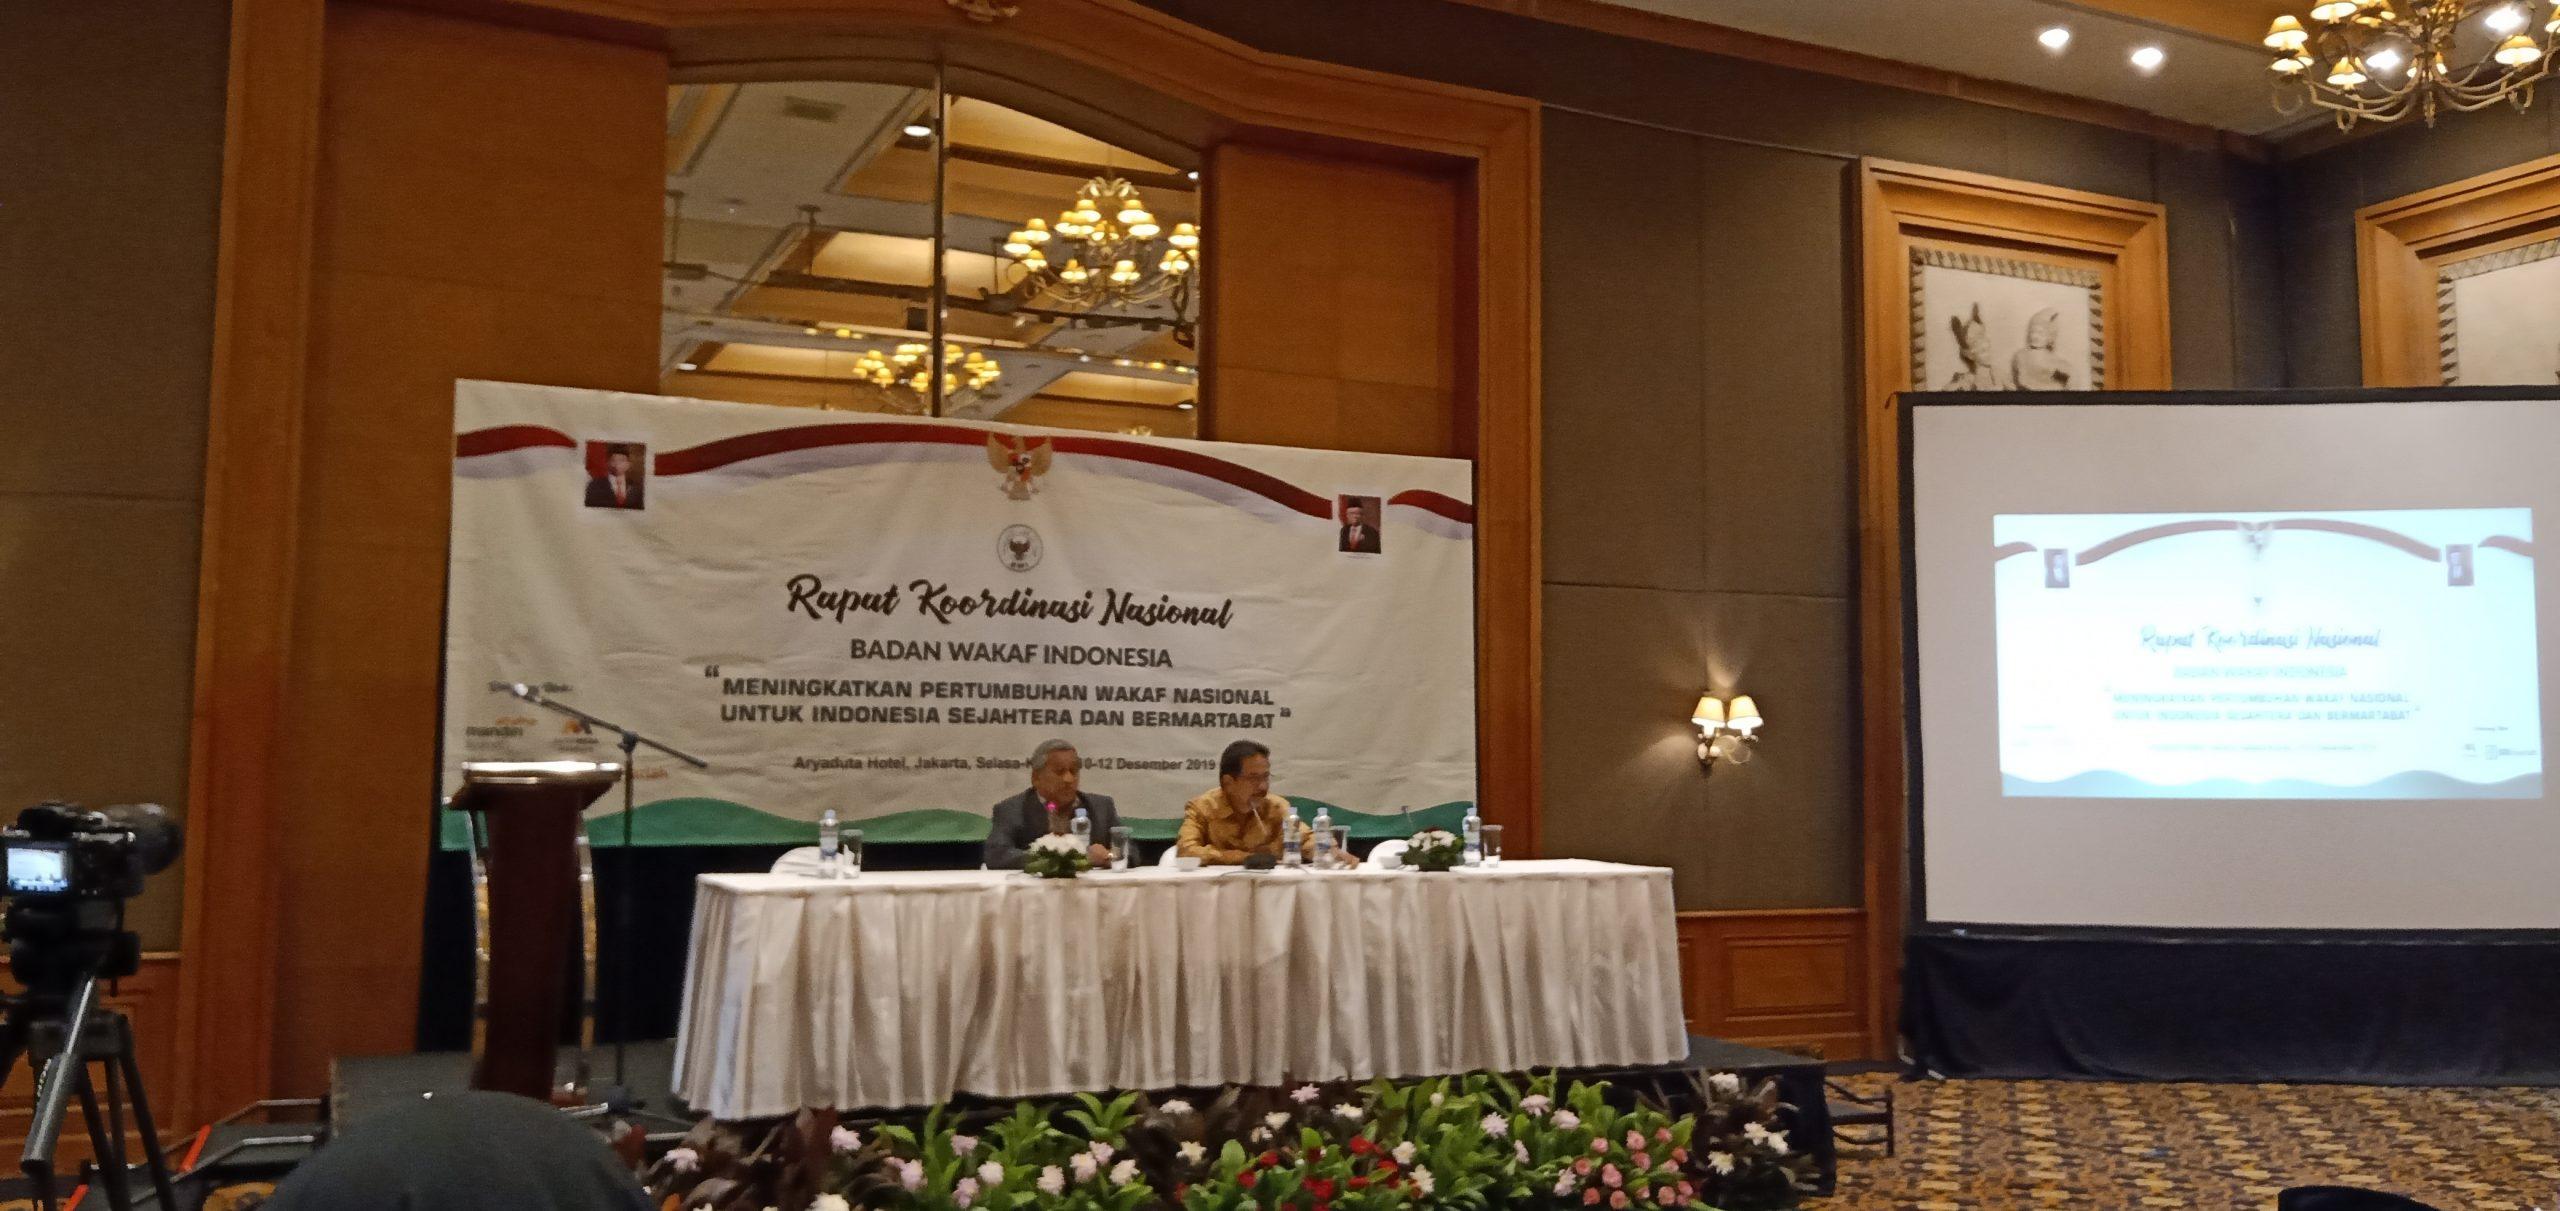 Kementerian ATR Permudah Sertifikasi Tanah Wakaf Melalu  Aturan Baru  - Menteri ATR Sofyan Jalil scaled - Kementerian ATR Permudah Sertifikasi Tanah Wakaf Melalu  Aturan Baru